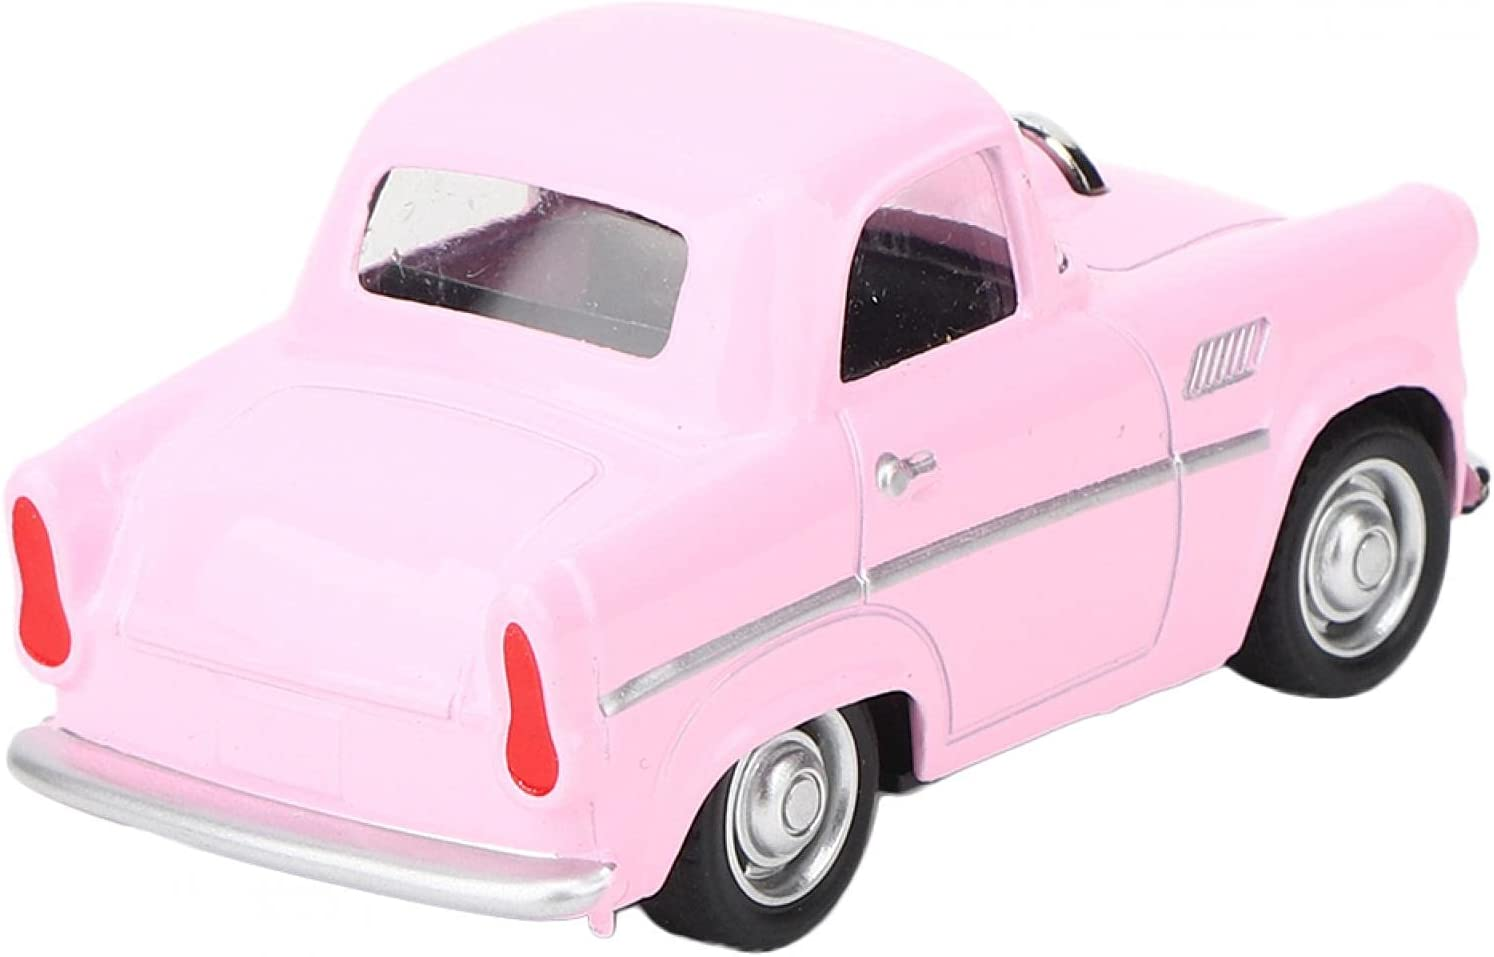 nwejron Pull Back Vehicle Mini Gir Award Toys Boys Car for Elegant